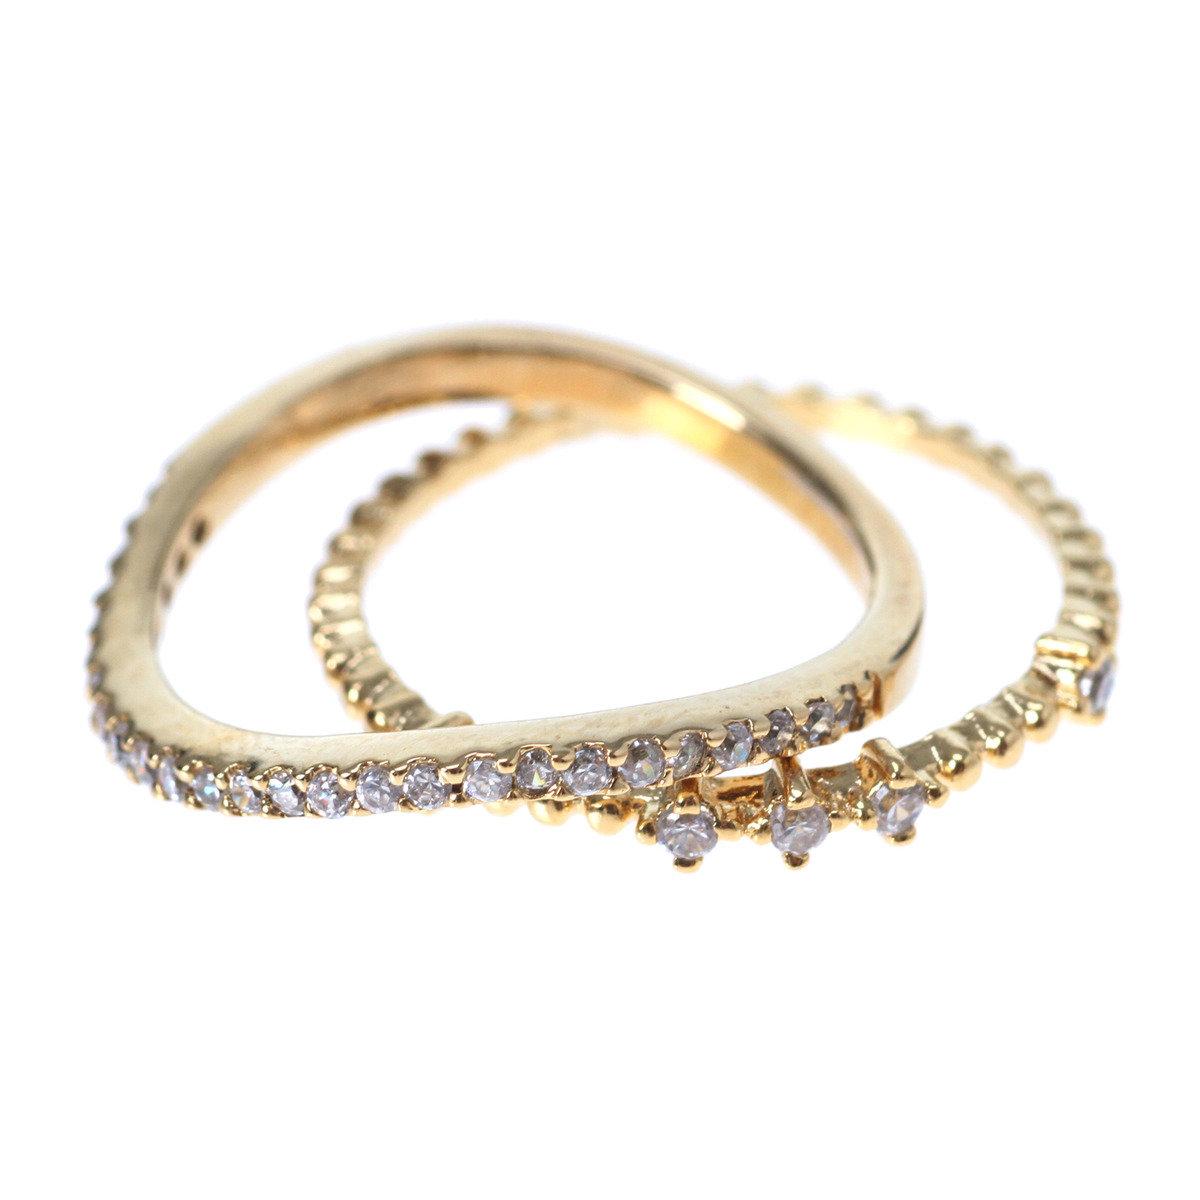 Ring Ring 925純銀閃爍戒指